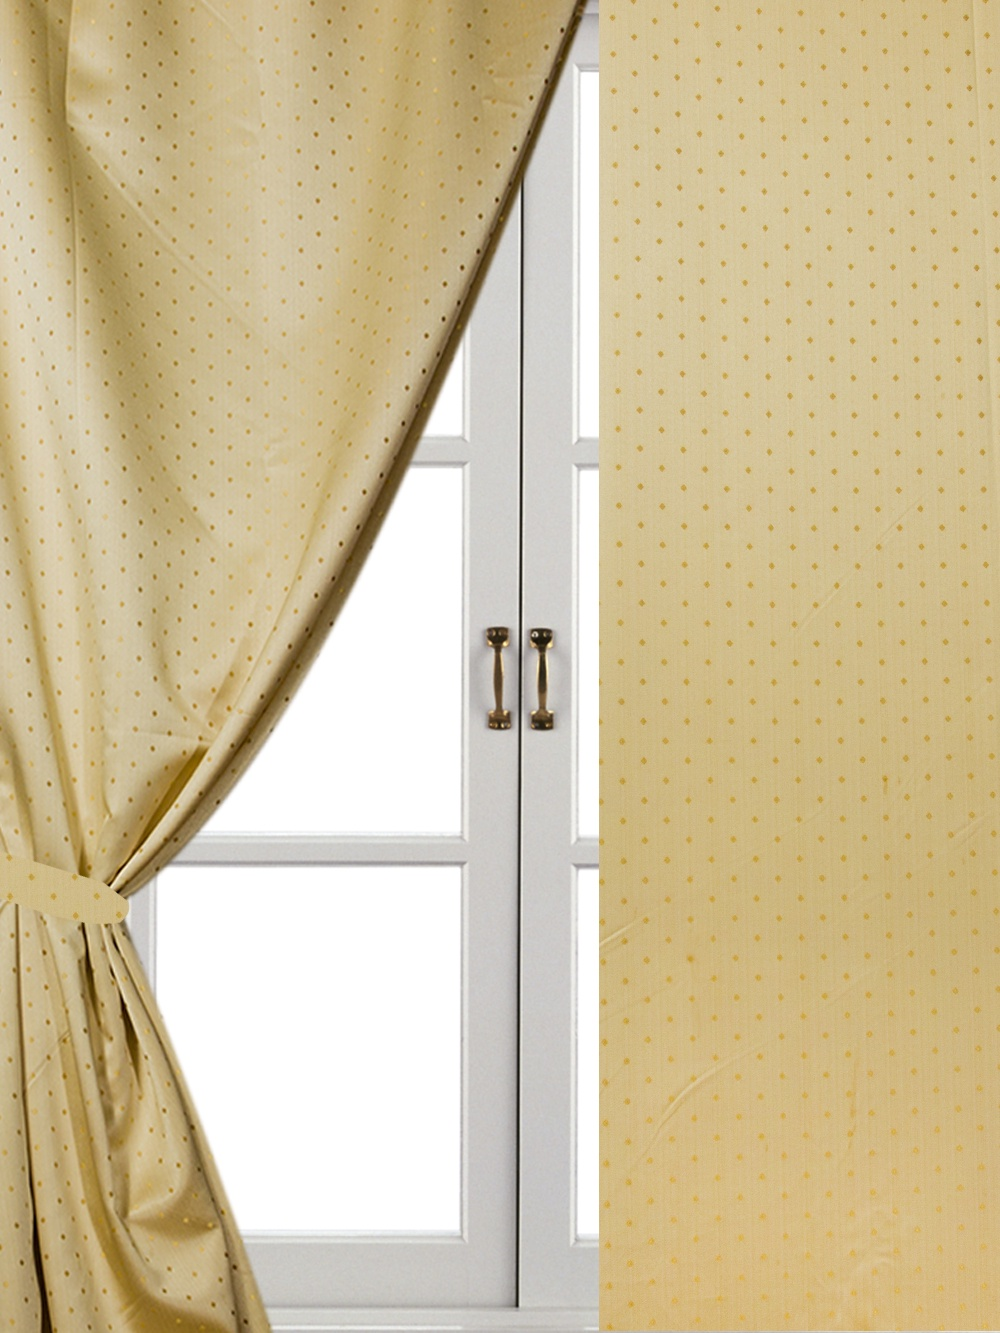 Шторы комнатные Айлант ОБ29 шторы homedeco нитяные шторы яркие кольца